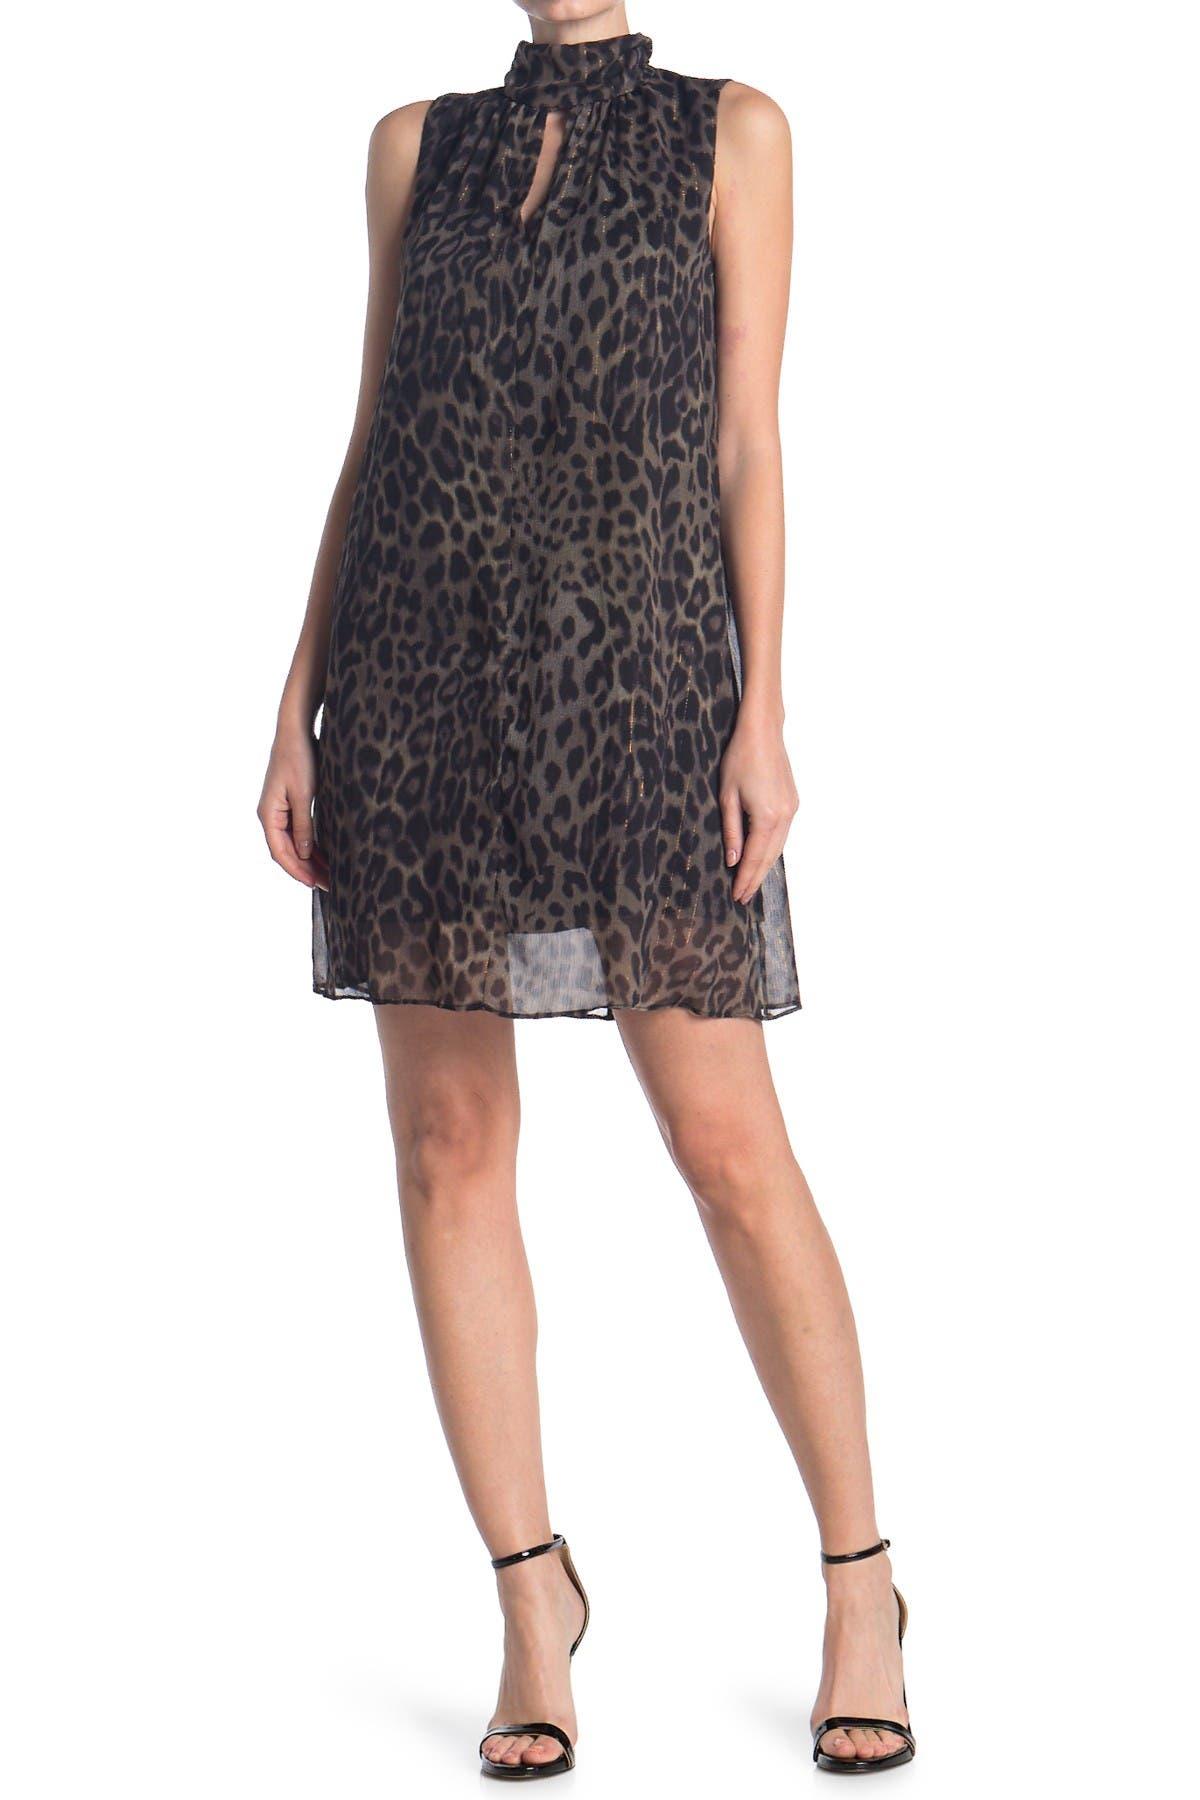 Image of London Times Leopard Print High Neck Swing Dress